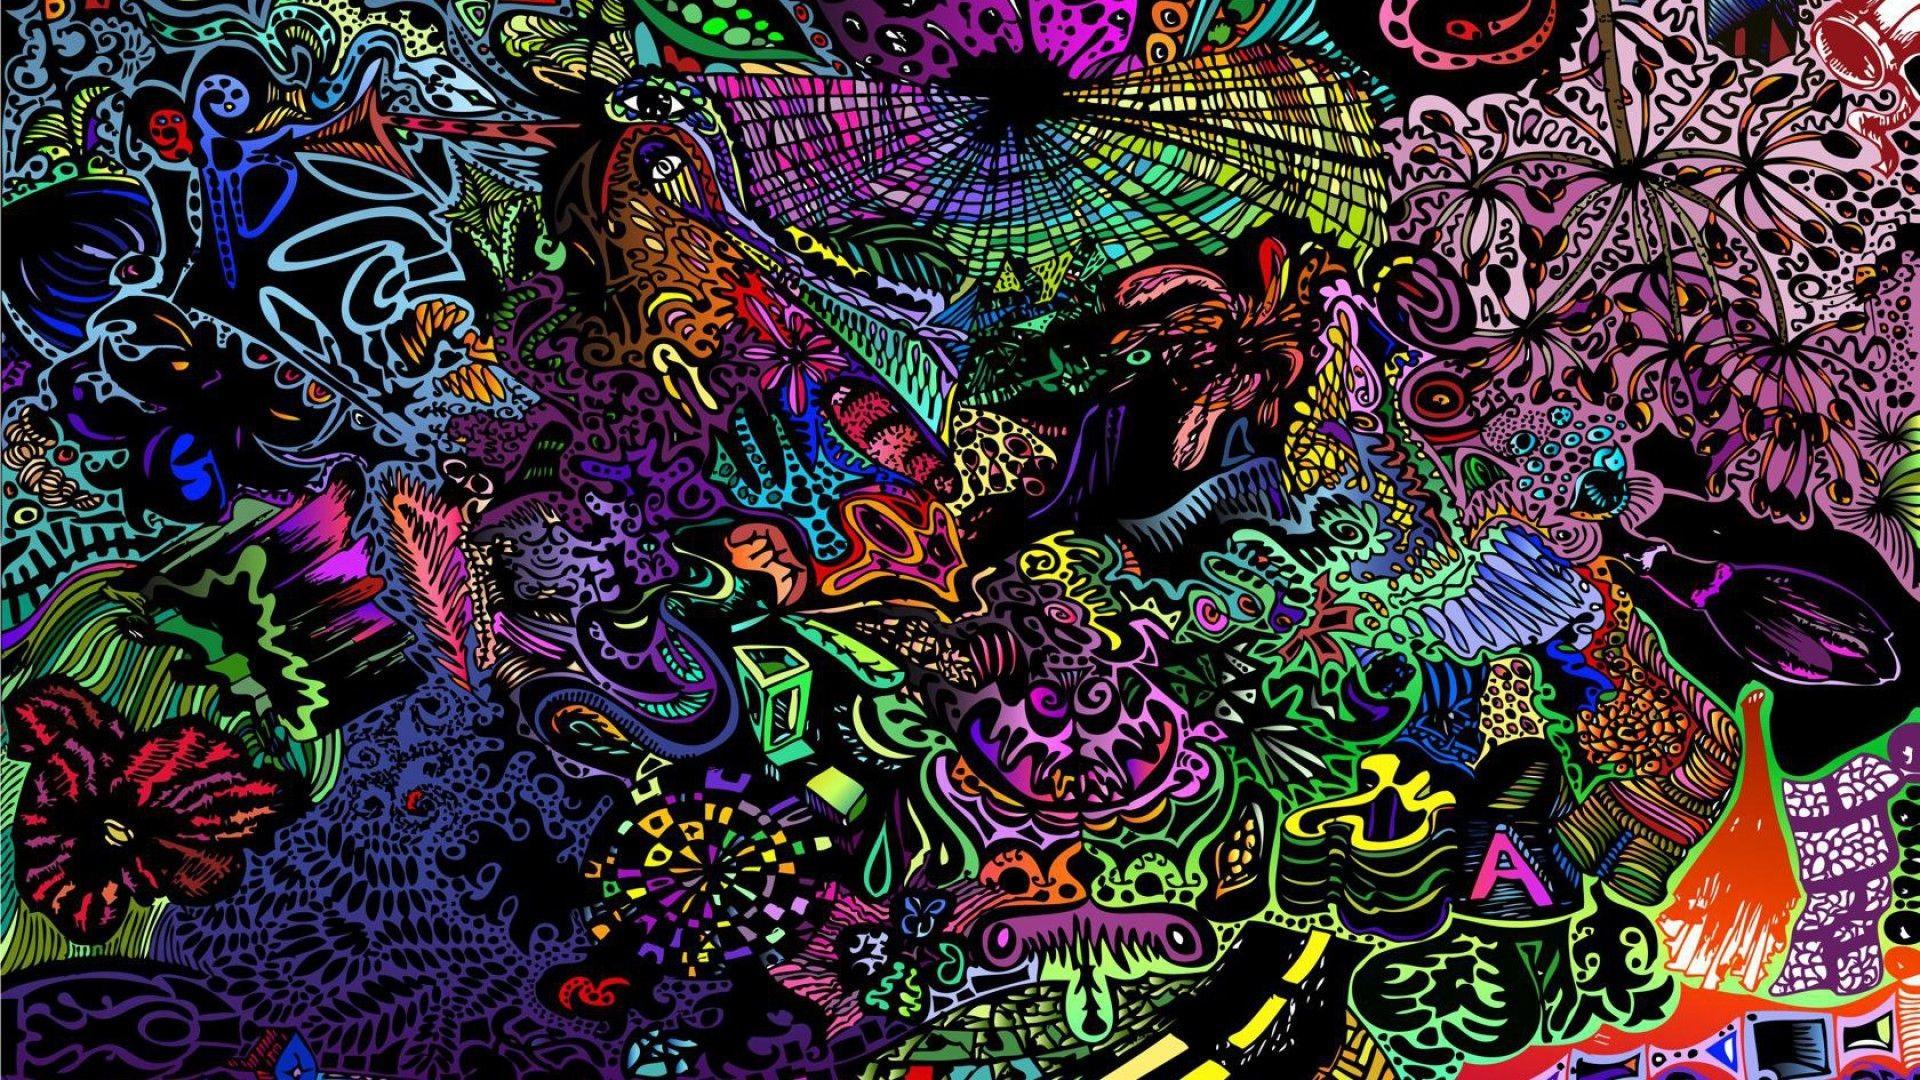 Res: 1920x1080, illuminati wallpaper tumblr - Google'da Ara